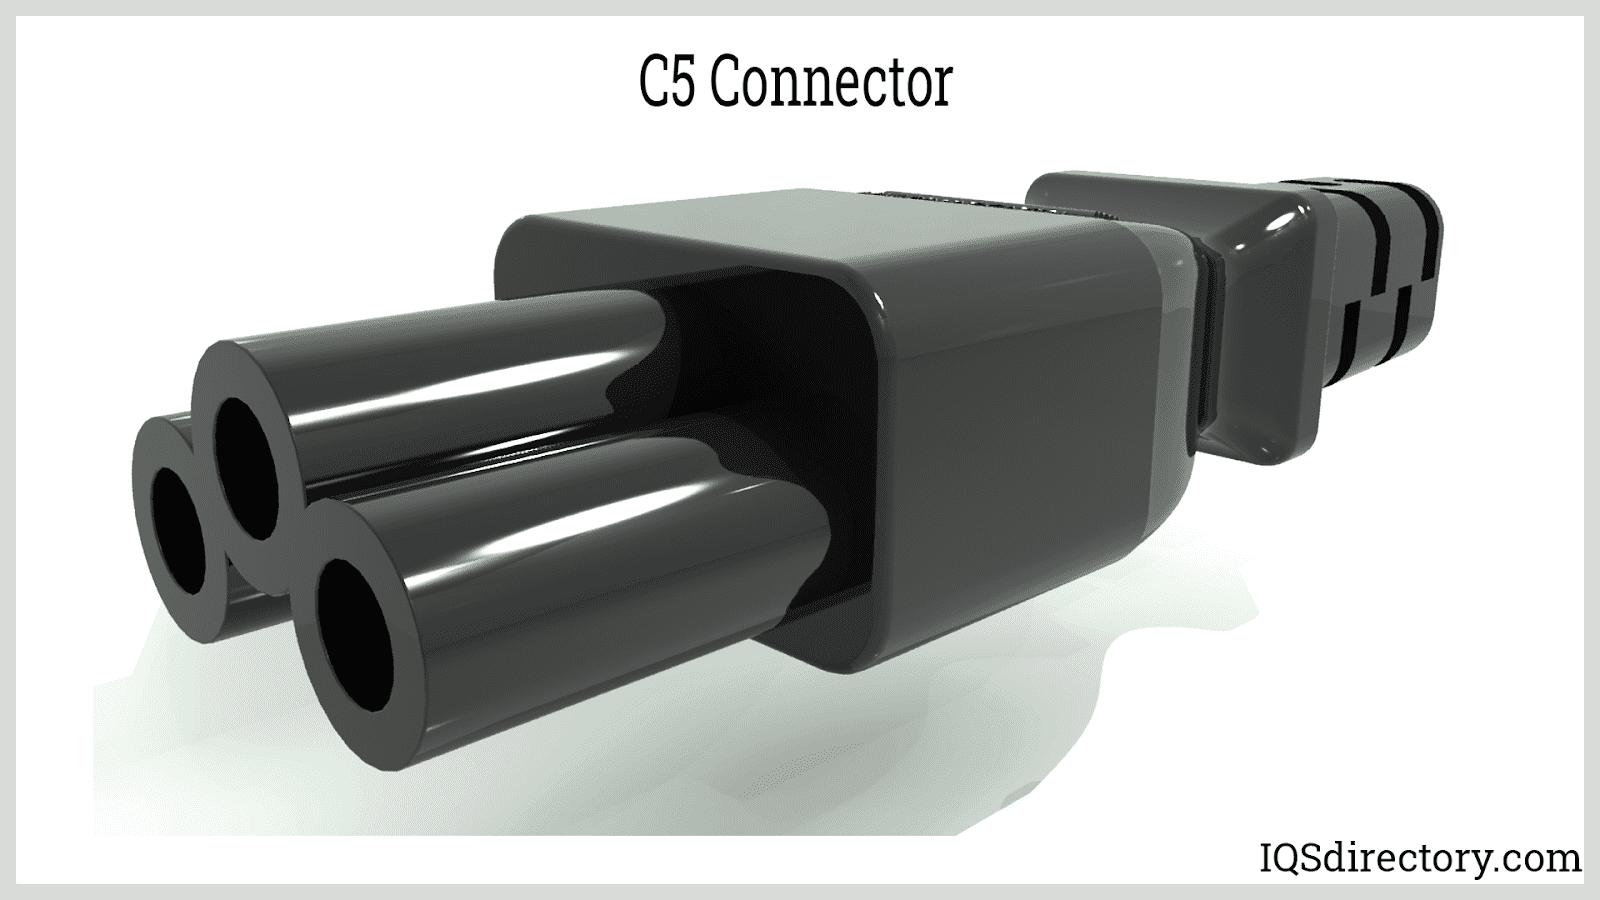 C5 Connector